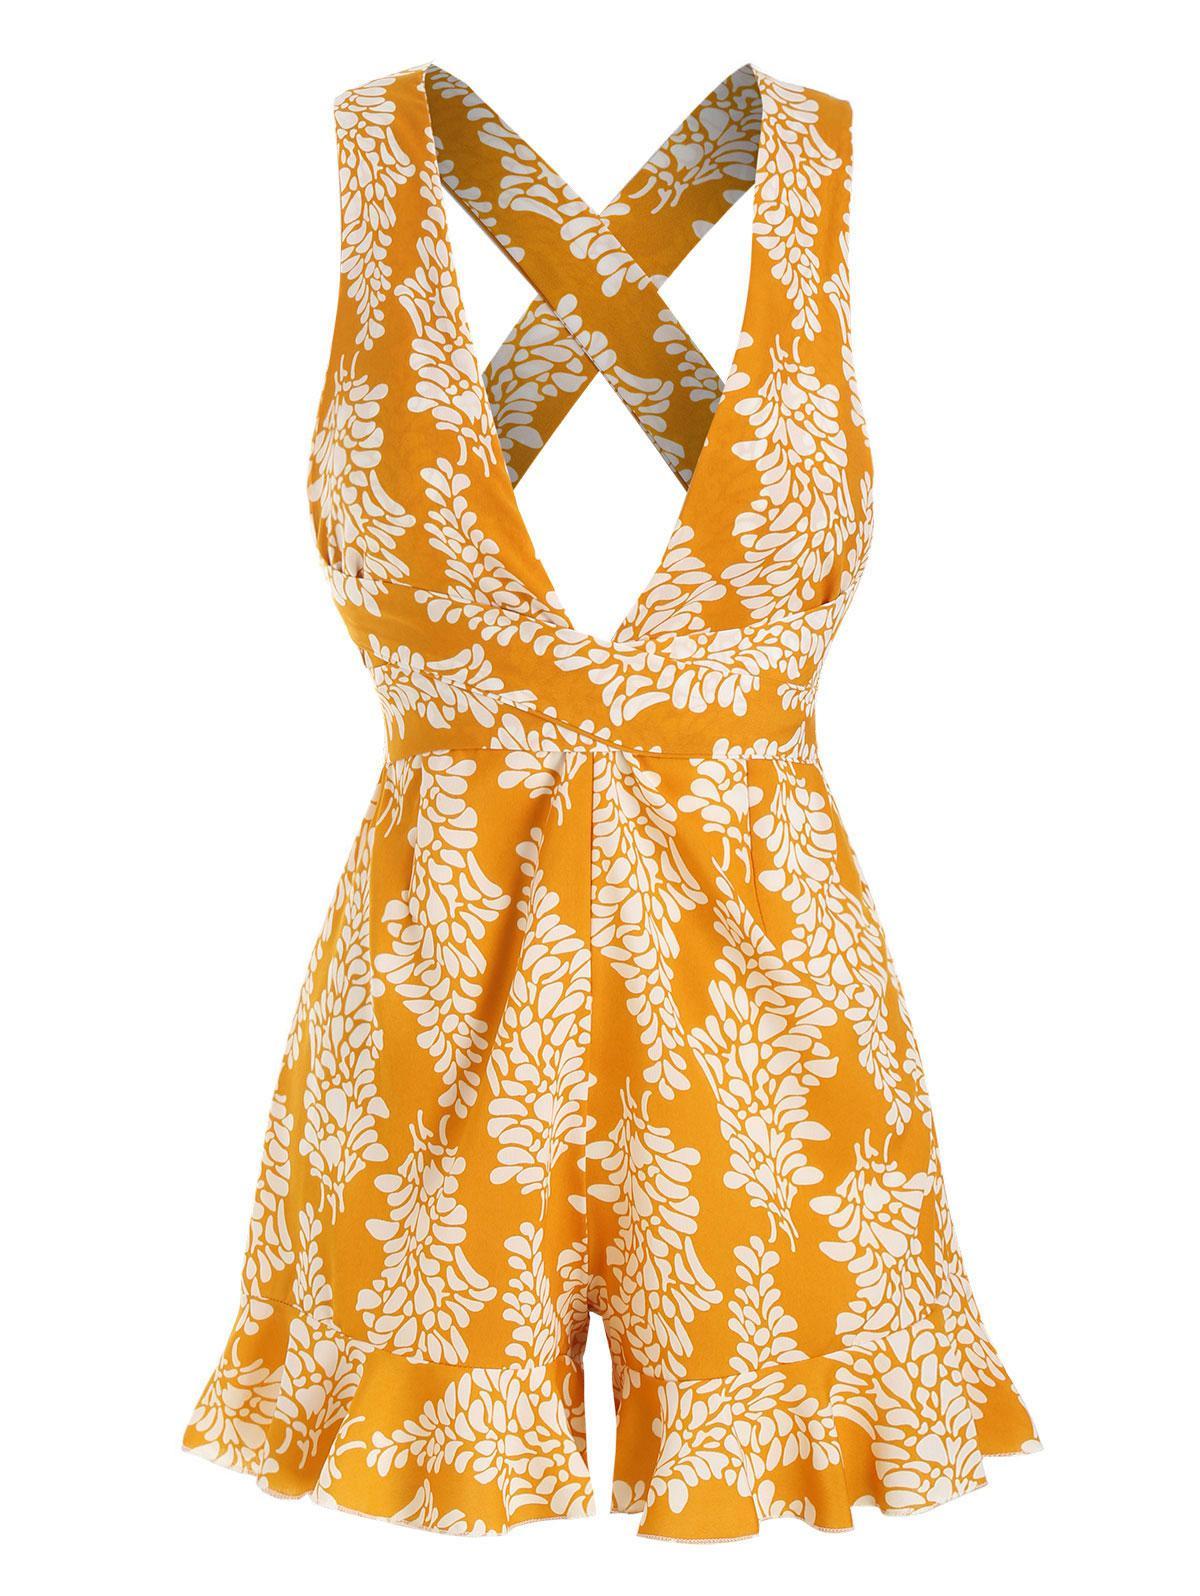 Tie Waist Printed Criss Cross Romper